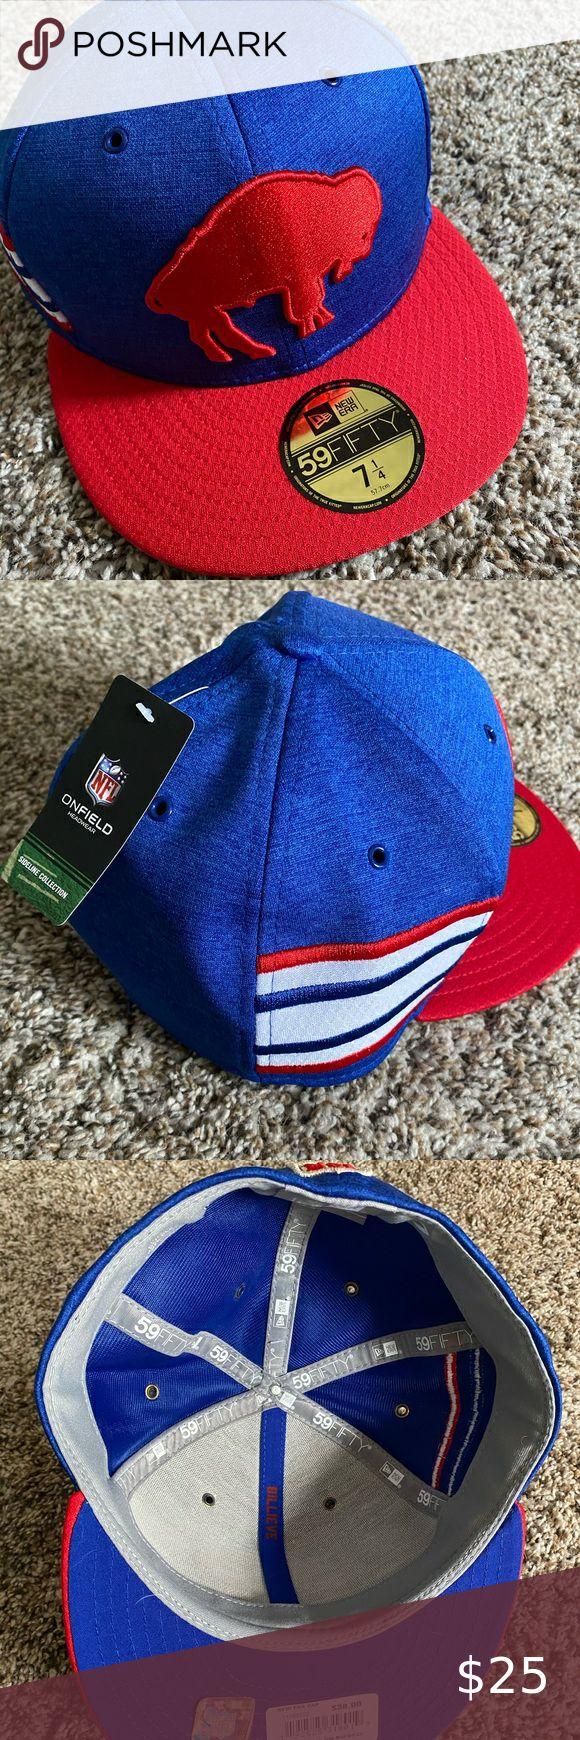 Nwt Buffalo Bills Onfield New Era Cap Brand New With Tags Buffalo Bills Official On Field Ball Cap Size 7 1 4 New Era Acces In 2020 New Era Cap New Era Clothes Design